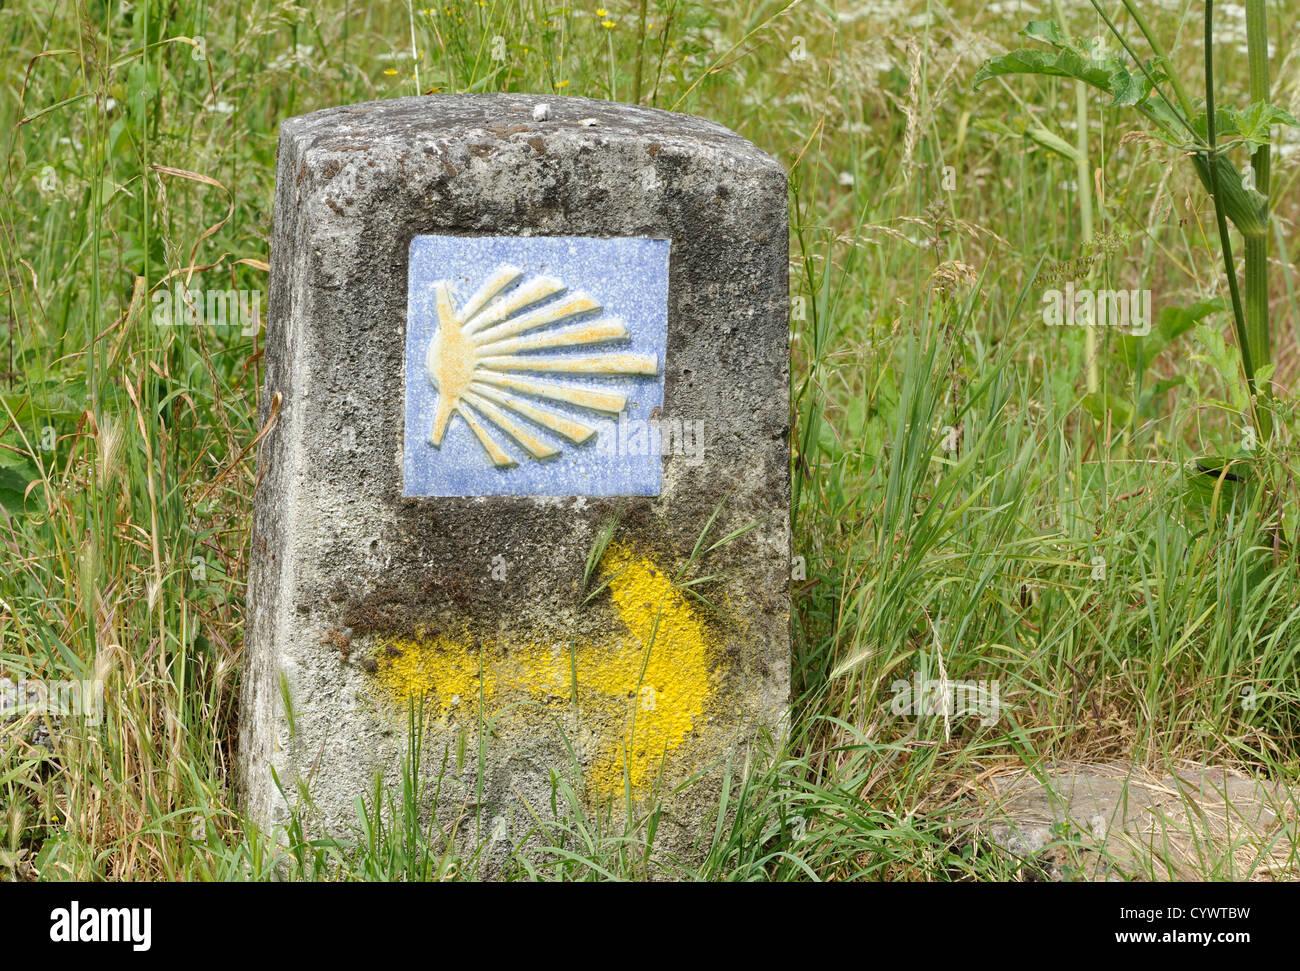 Scallop shell symbol marking the pilgrim's path to Santiago  de Compostela. Herrerias, Leon, Galicia, Spain - Stock Image